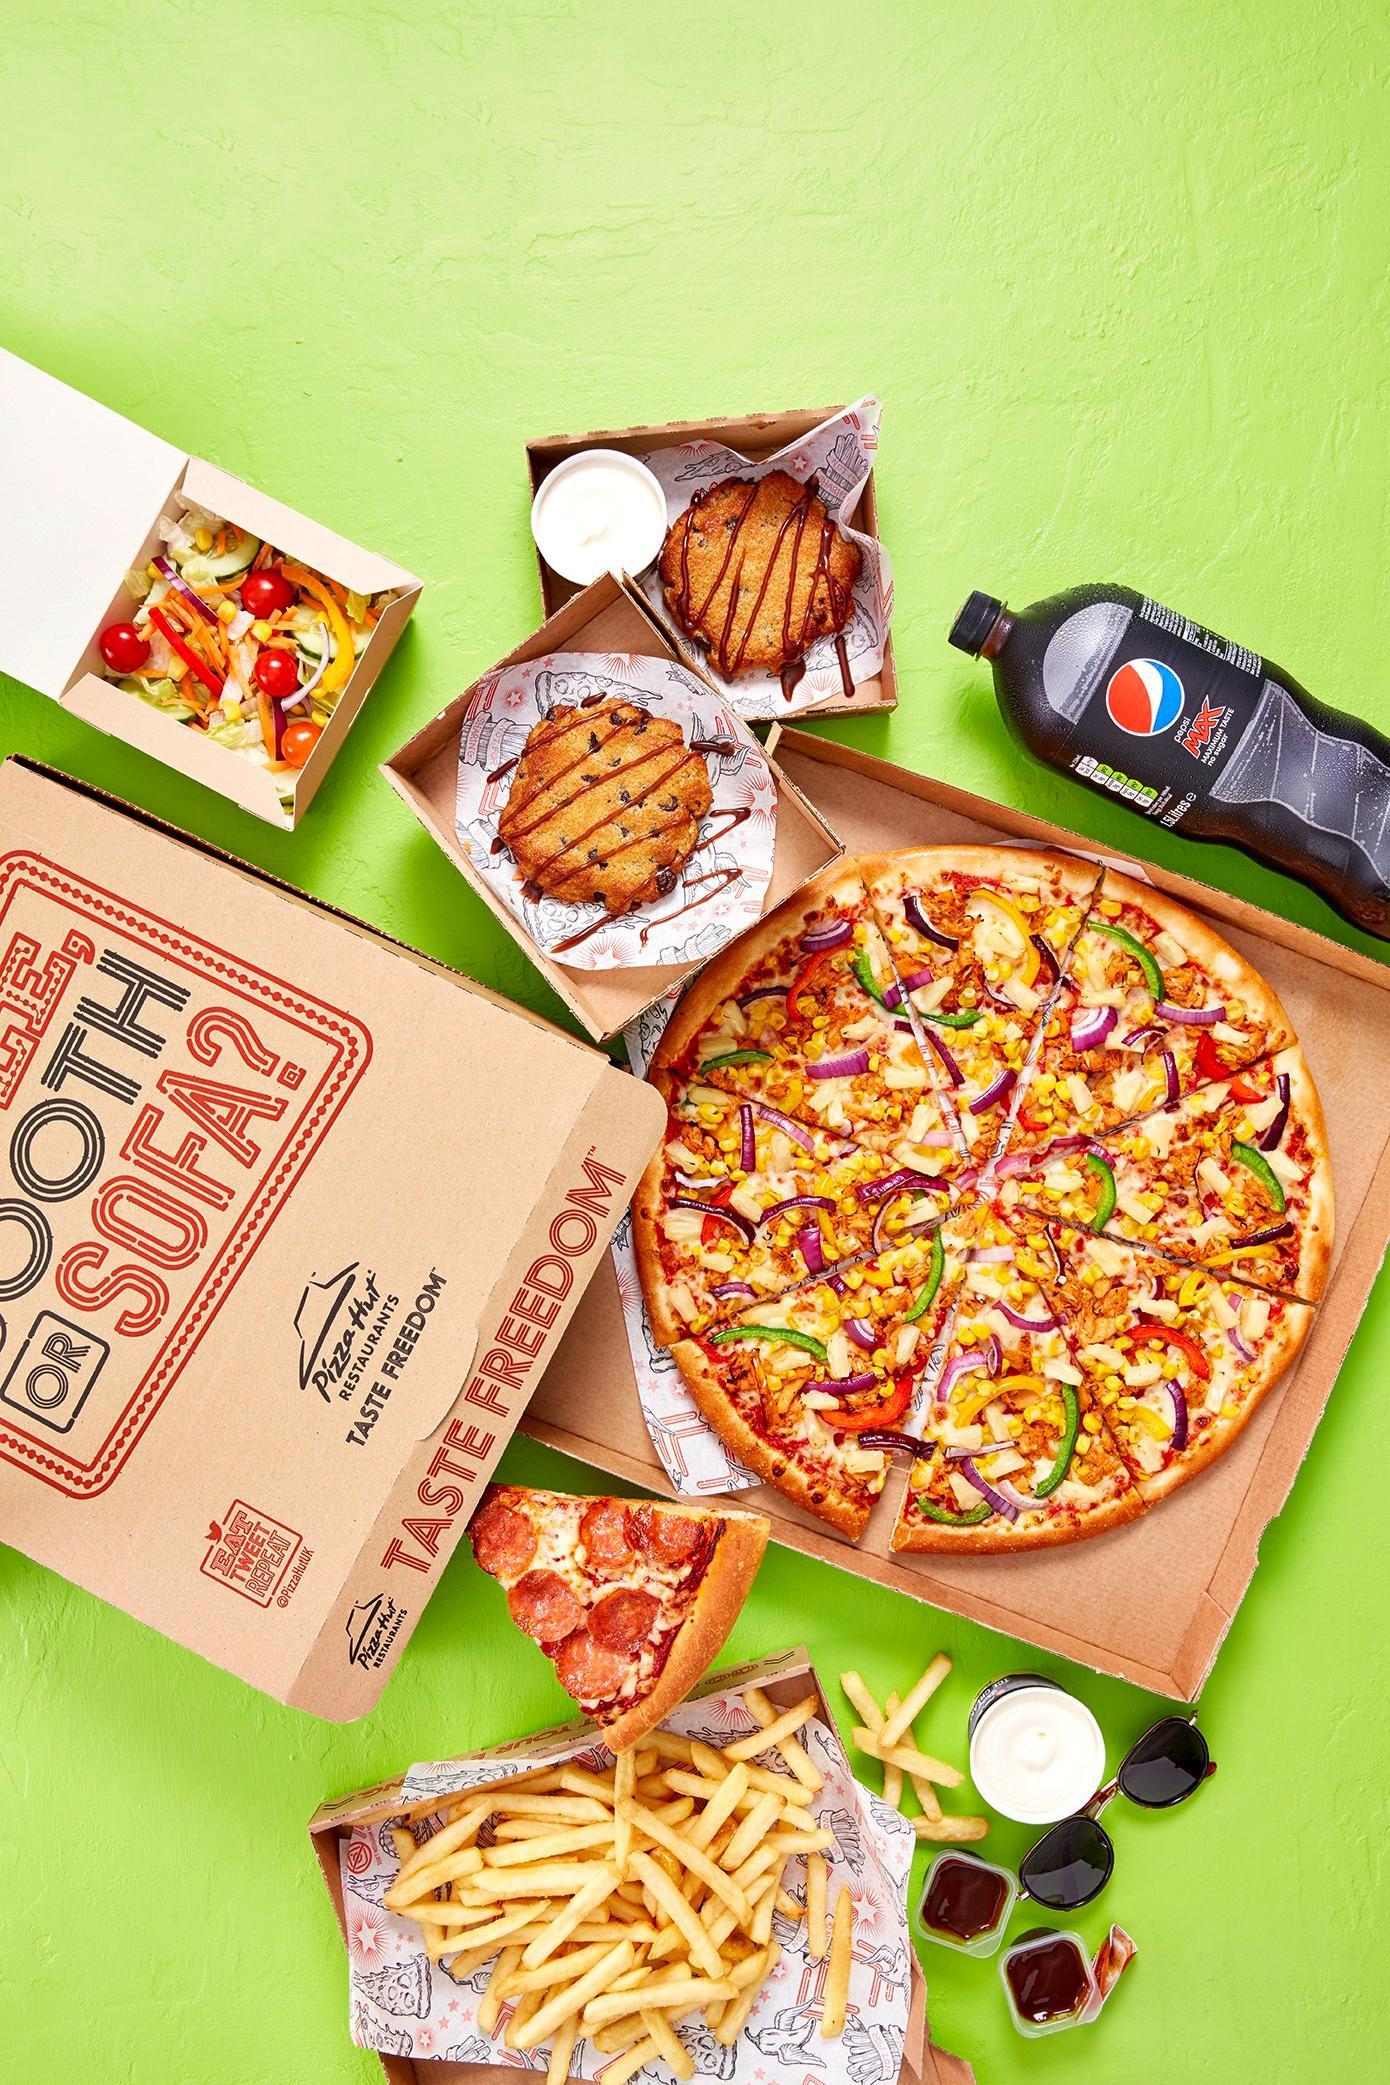 Pizza Hut Restaurants - Takeout Deals from £10.99. Pizza Hut Restaurants Glasgow 01236 721122